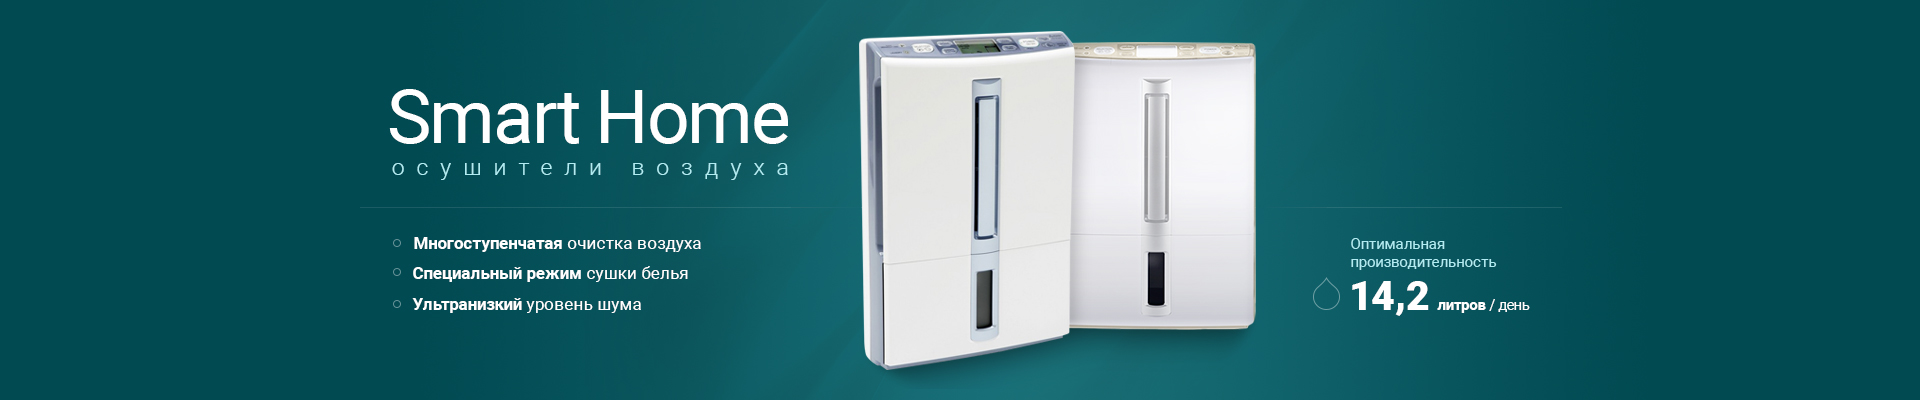 mitsubishi-electric-smarthome.jpg